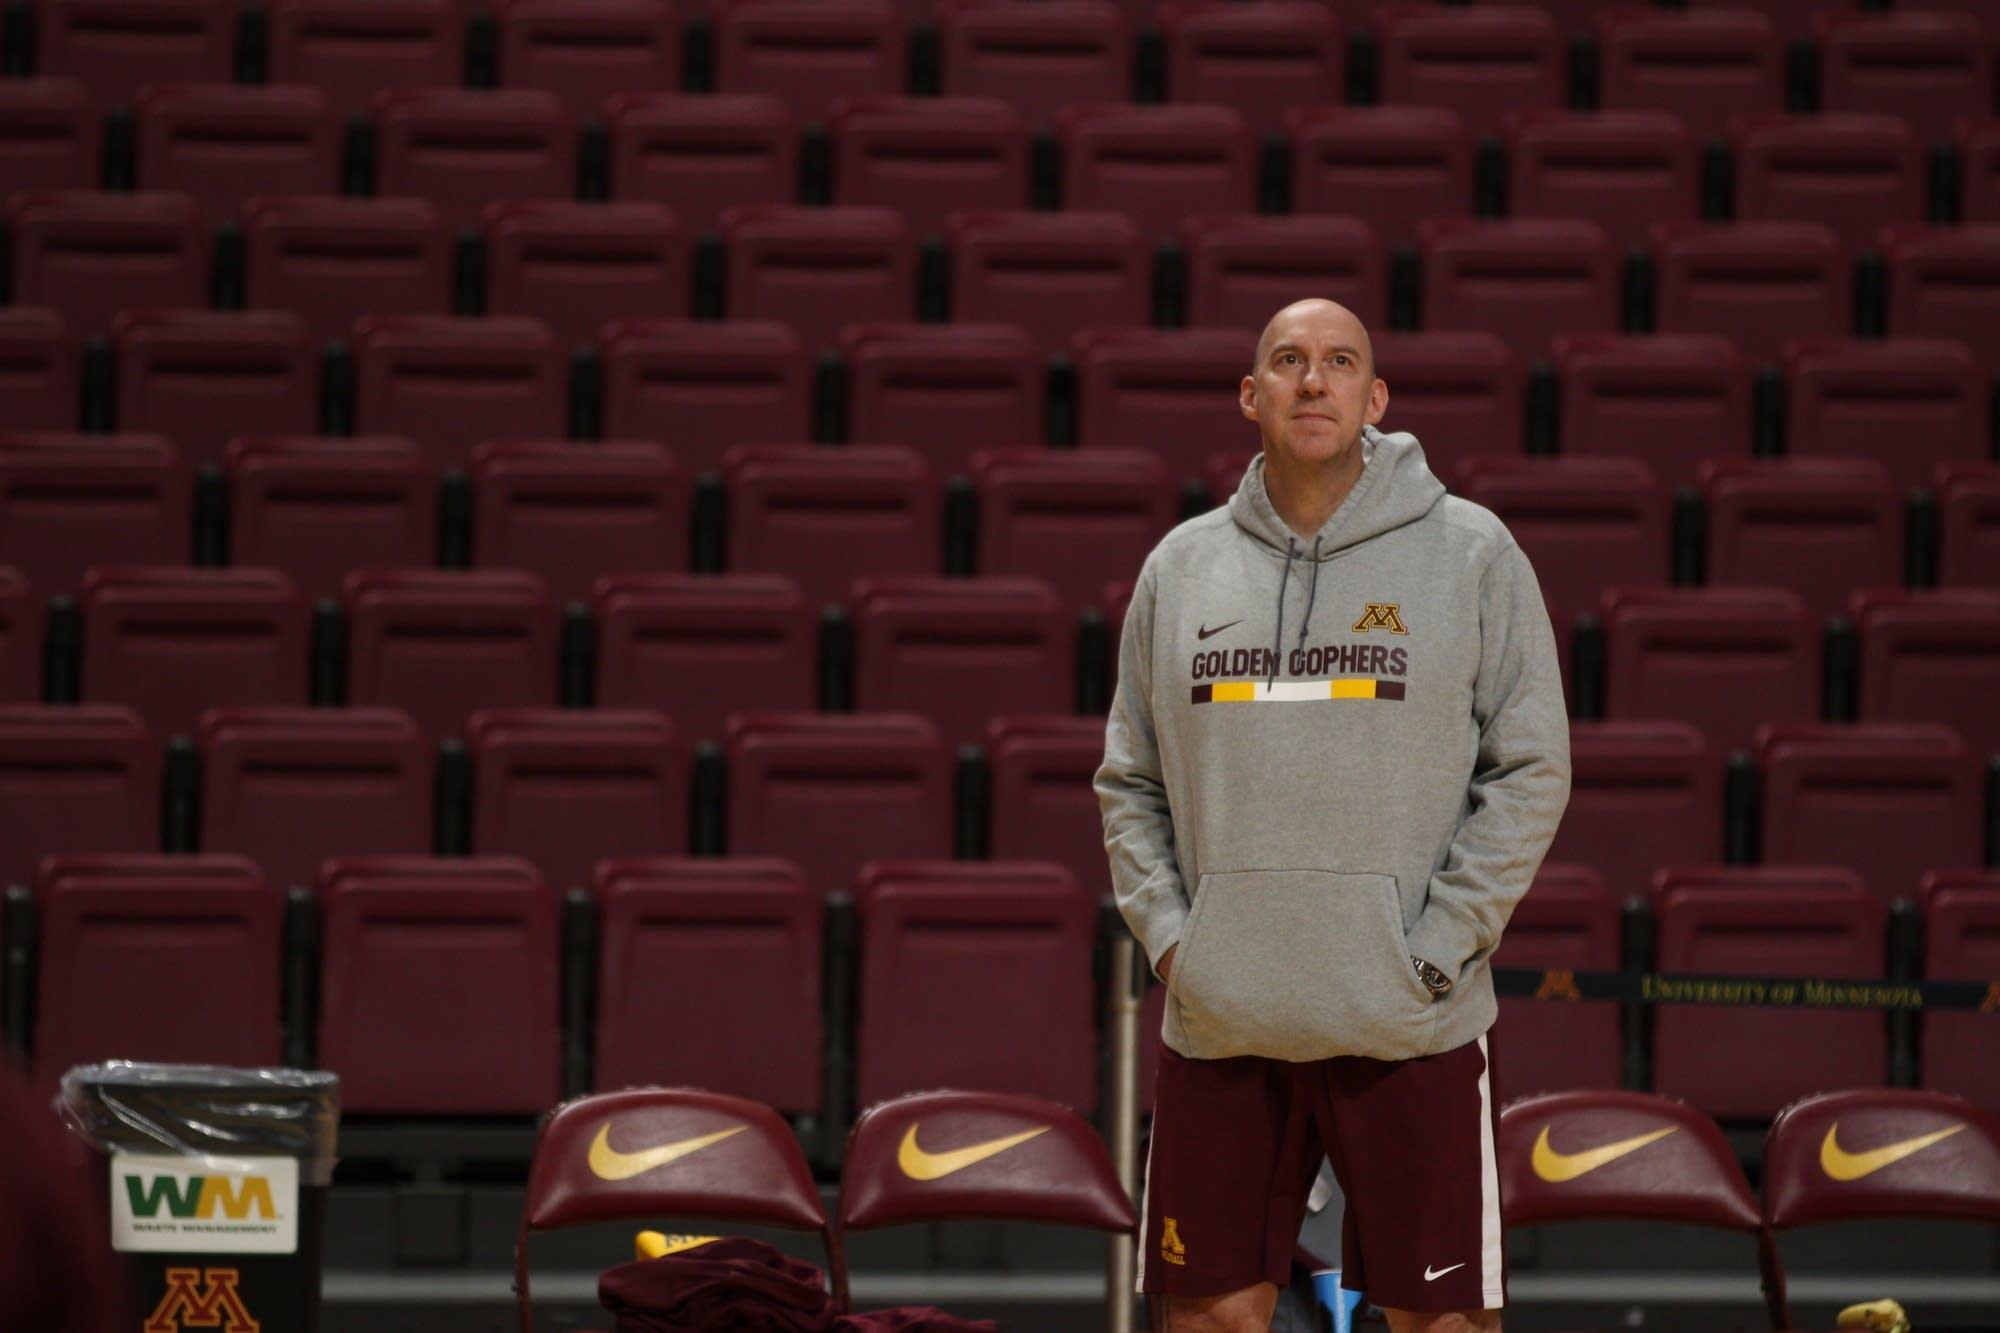 University of Minnesota Head Women's Volleyball Coach Hugh McCutcheon